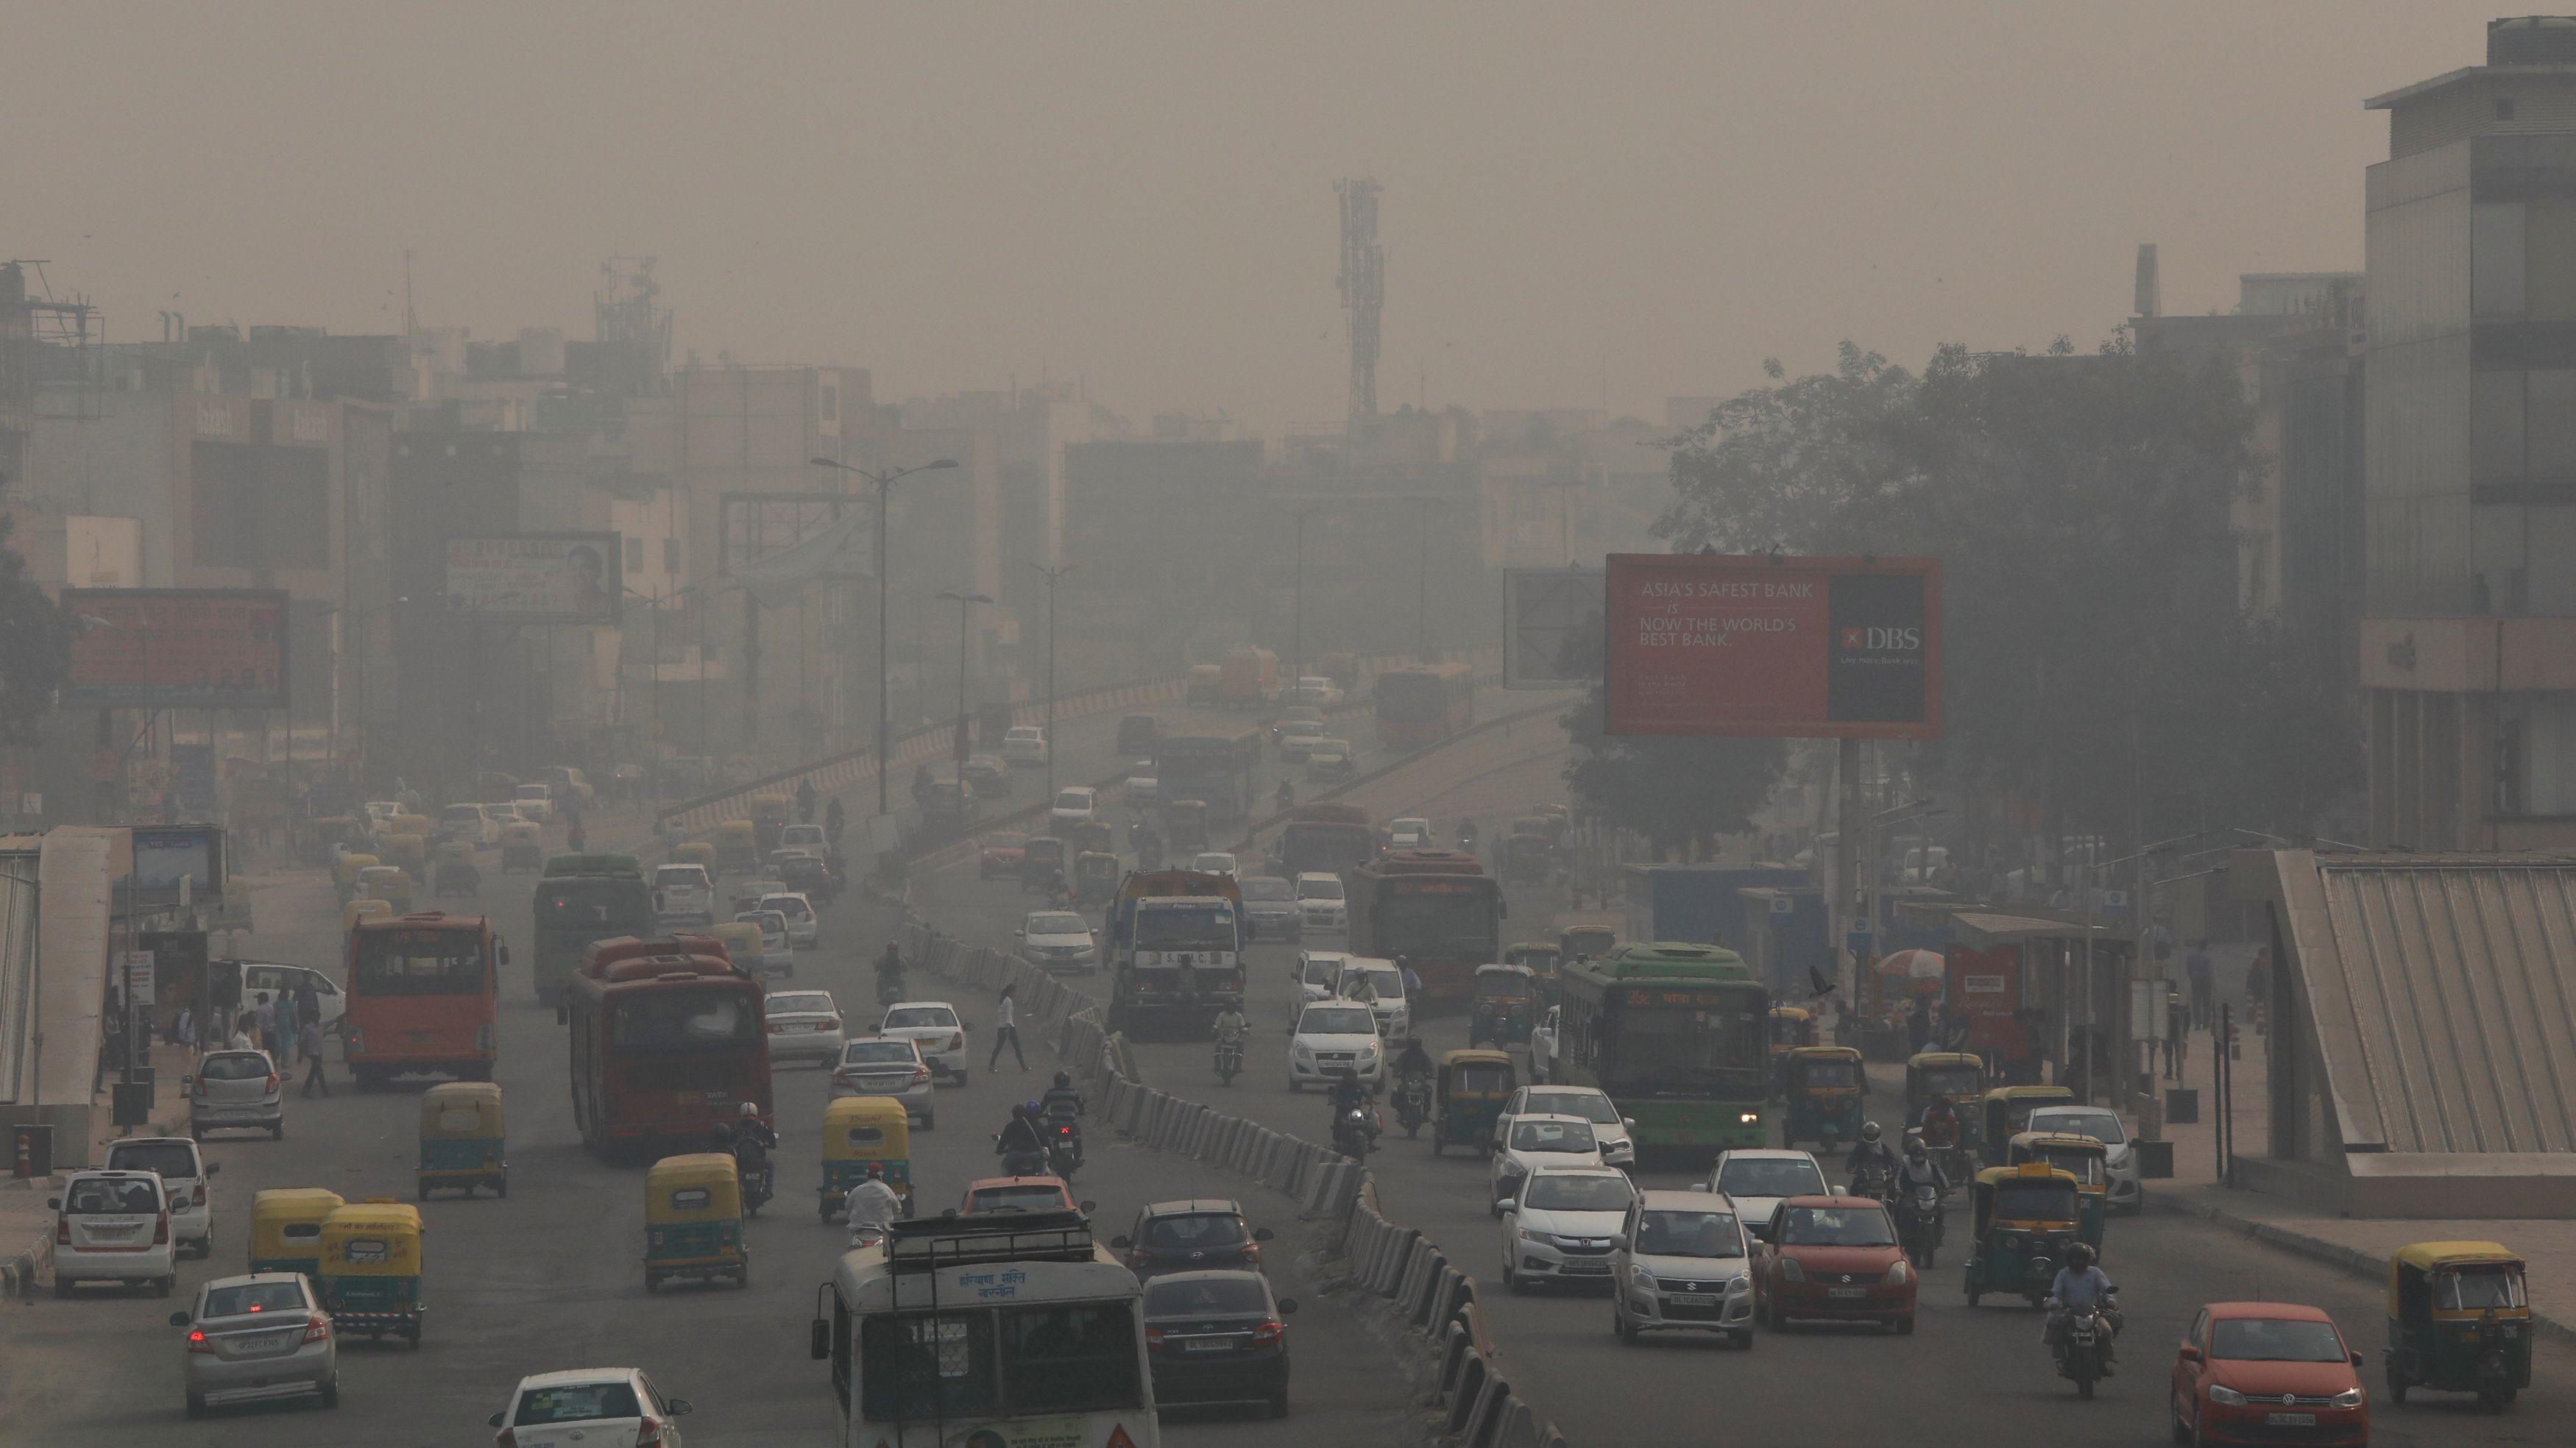 Vehicles drive through smog in New Delhi, India, November 8, 2018.